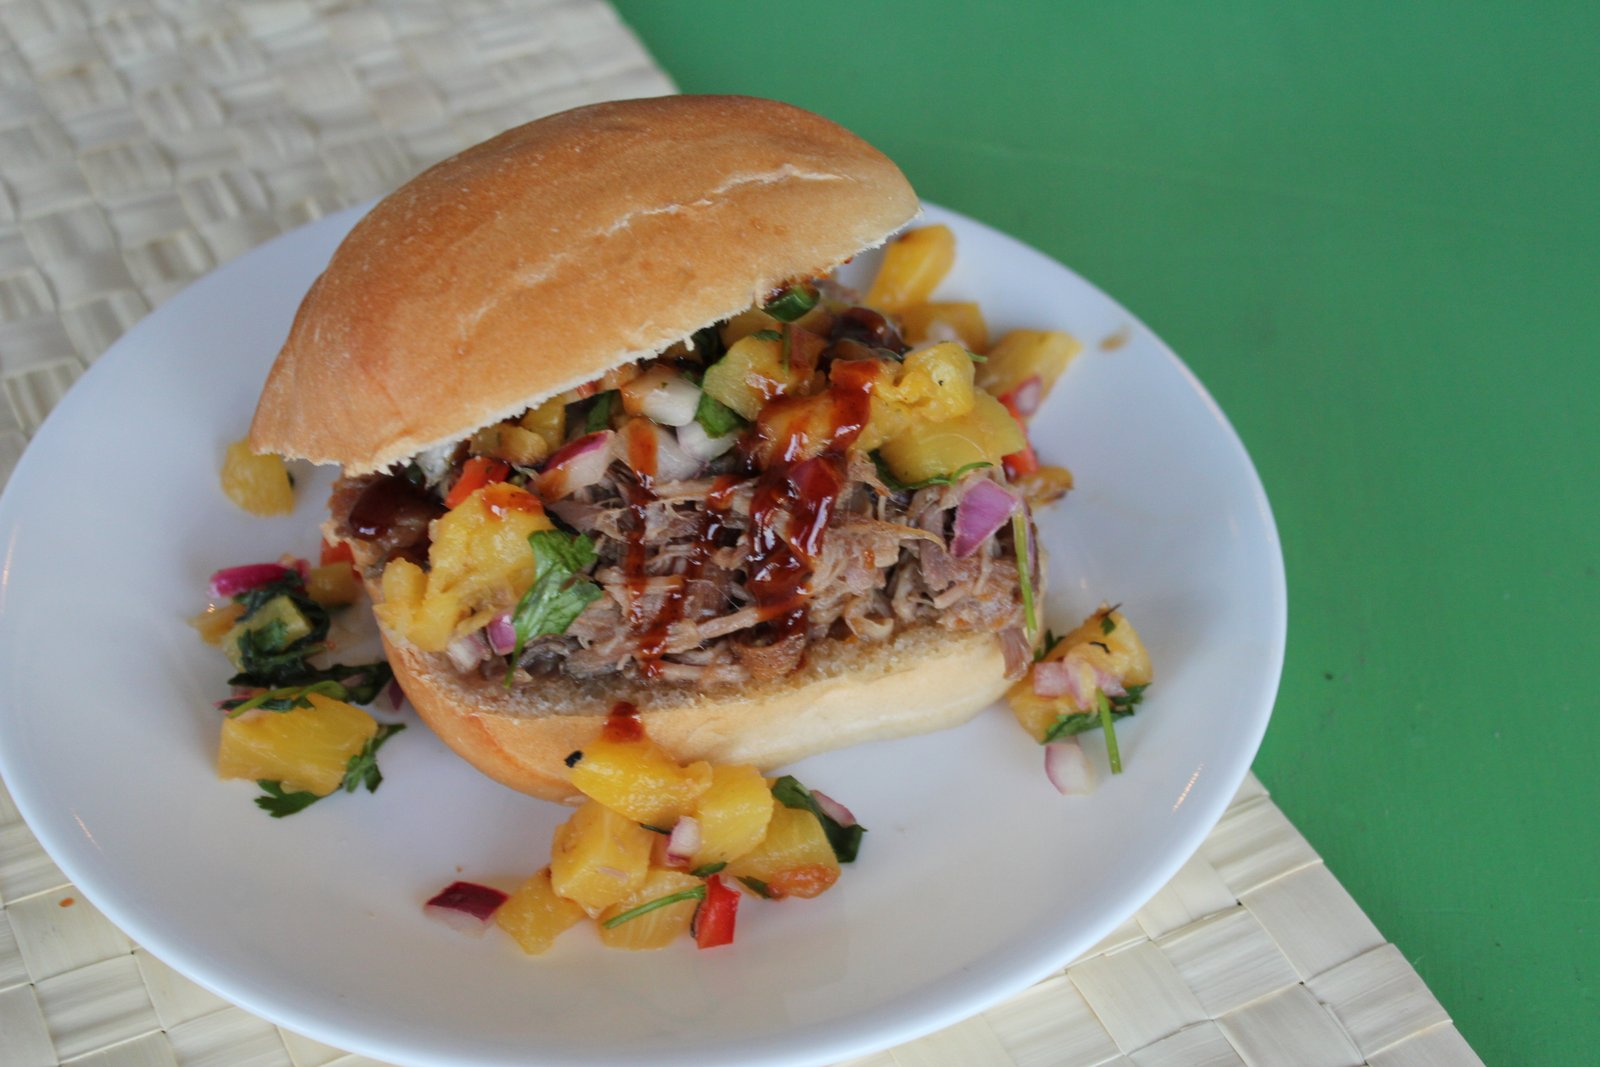 ... Bun - Hawaiian BBQ Pulled Pork Sandwich with Grilled Pineapple Relish